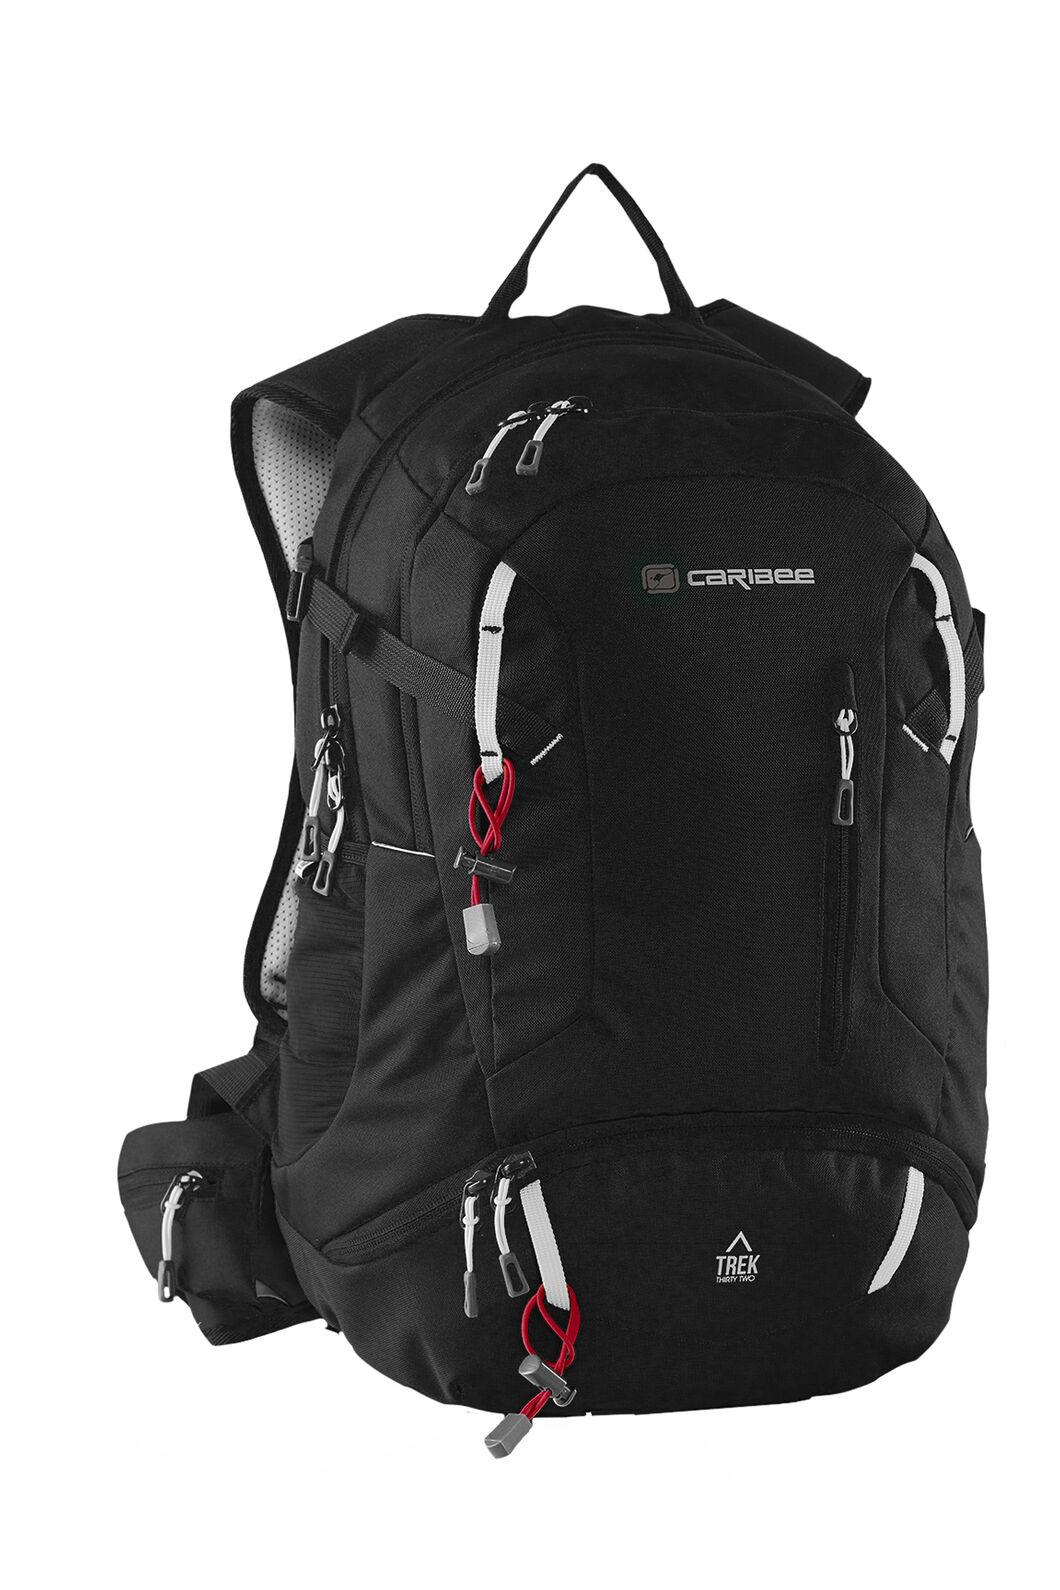 Caribee Trek 32L Backpack, Black, hi-res